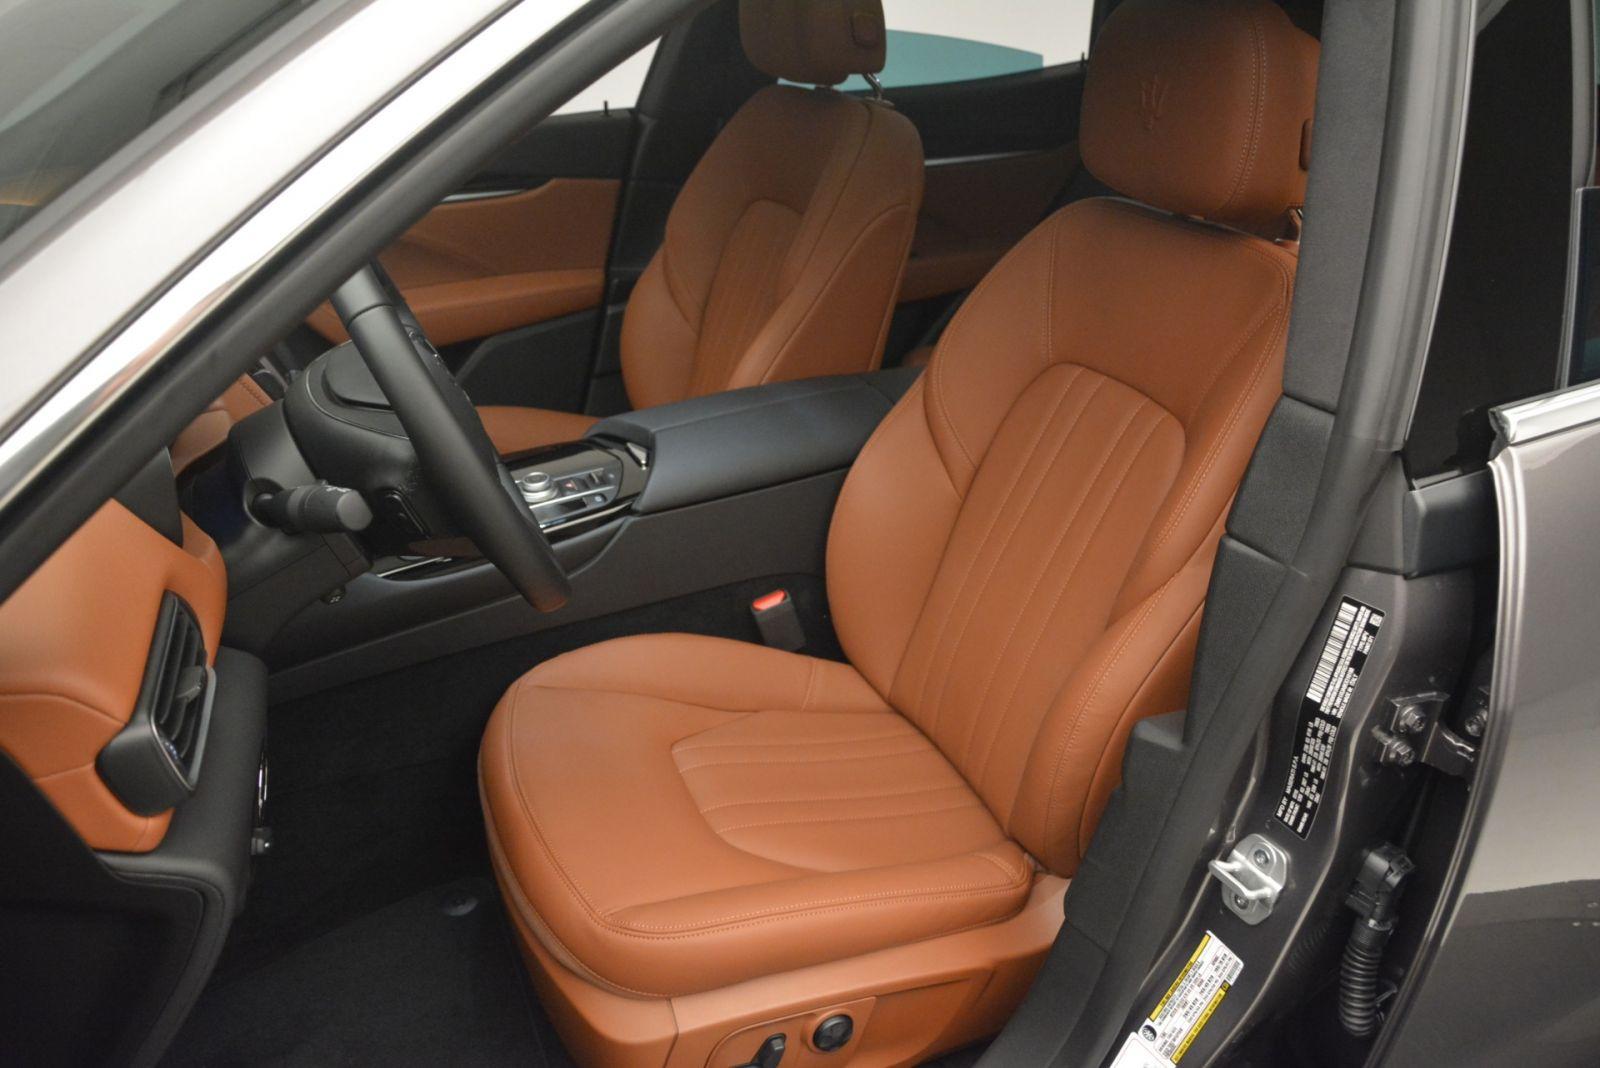 Maserati Levante 5 Chỗ Đối Thủ Porsche Cayenne 2020 Giá Bao Nhiêu - ghế da bò nâu vàng